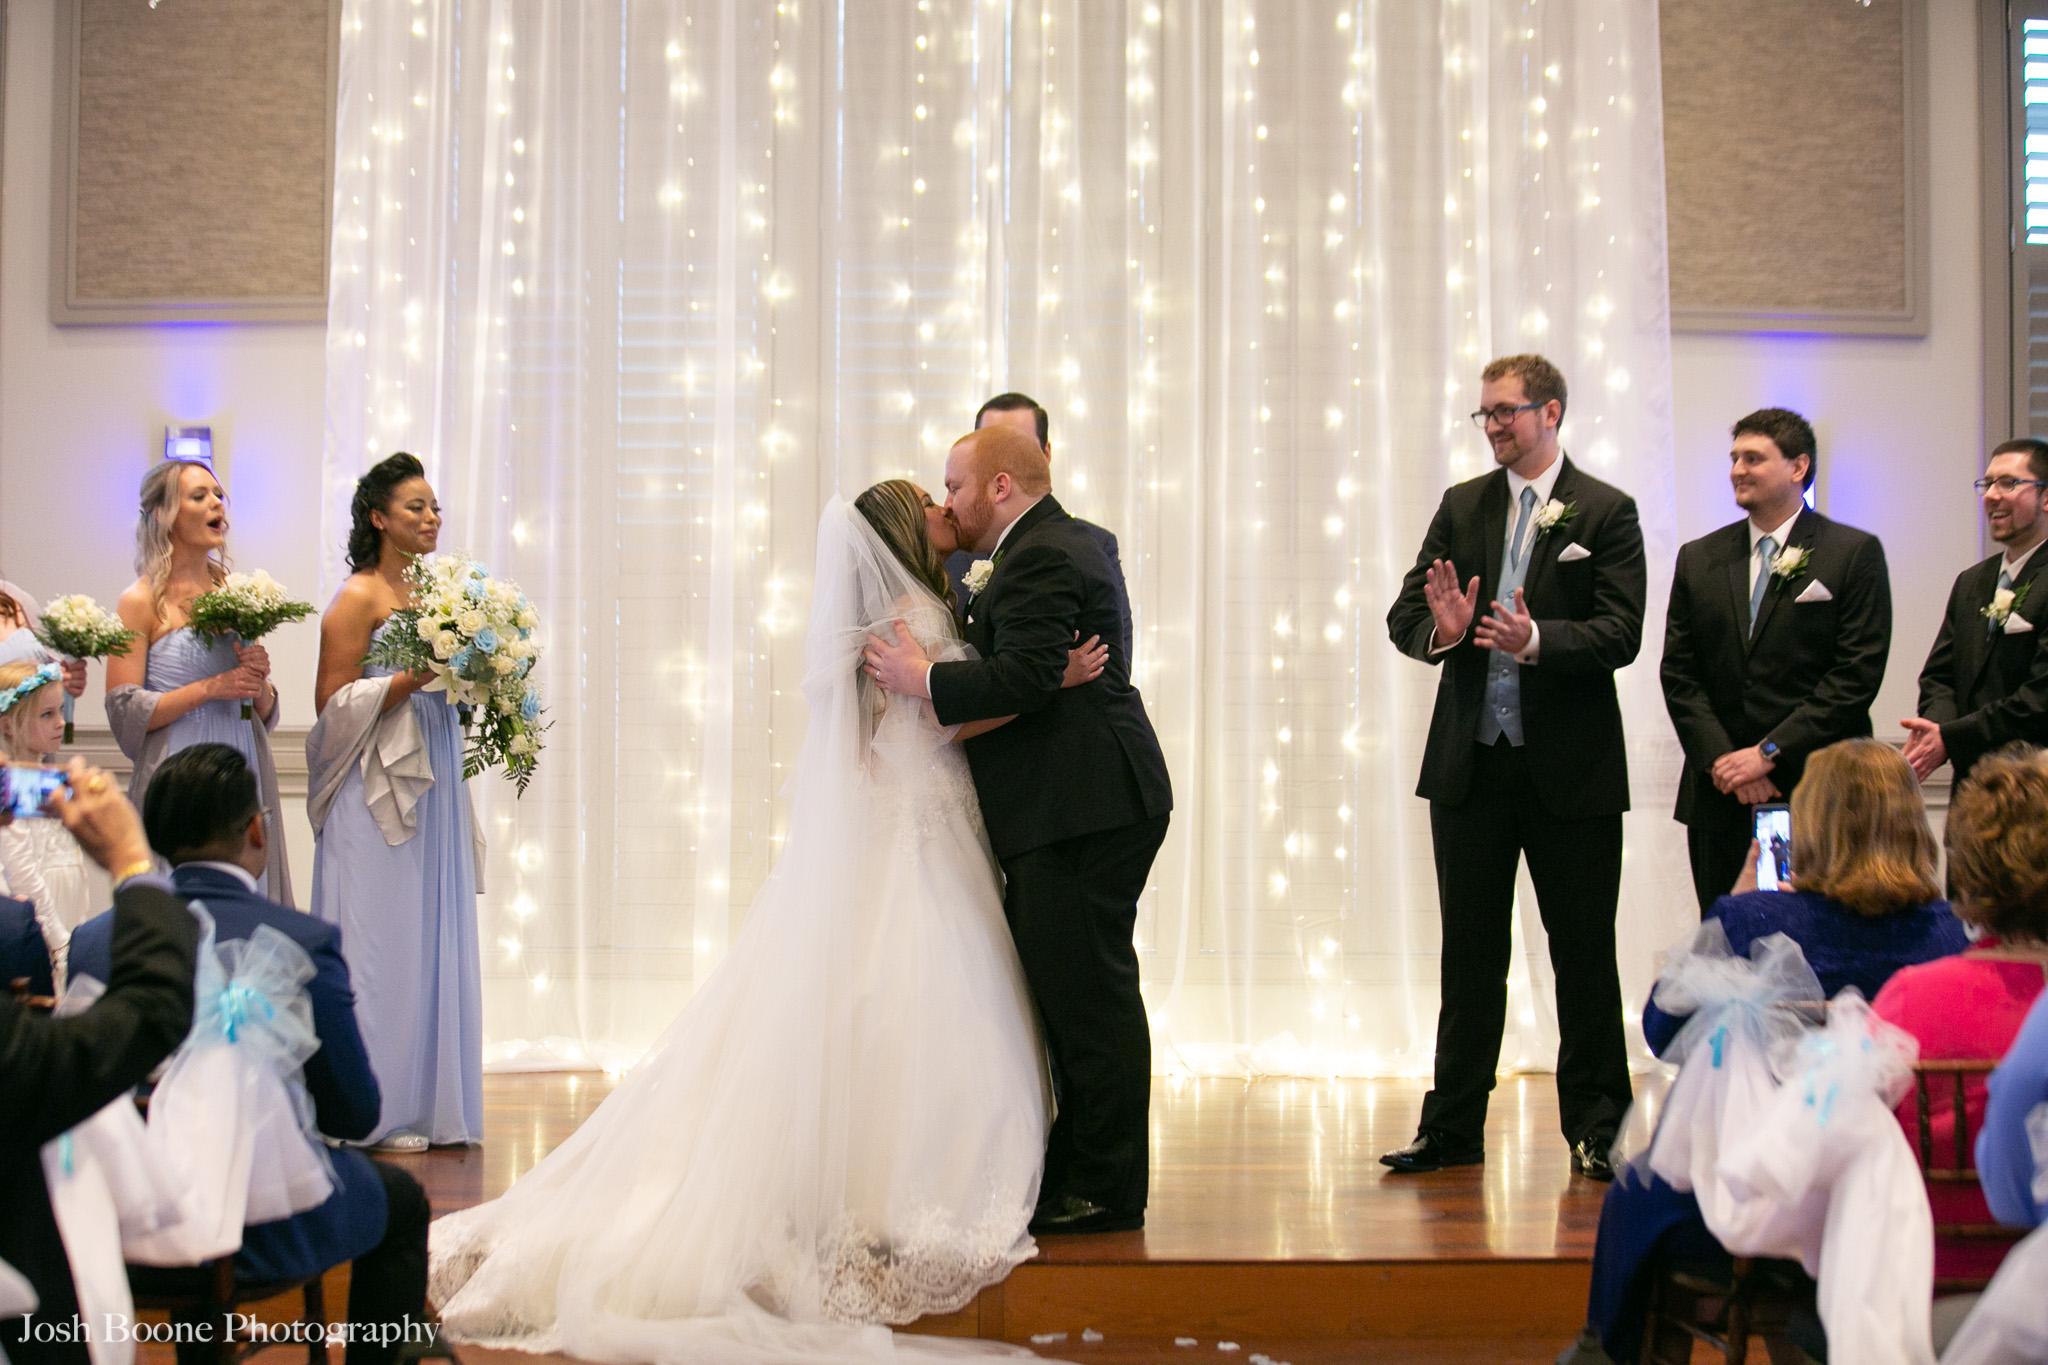 noahs_event_venue_wedding-48.jpg